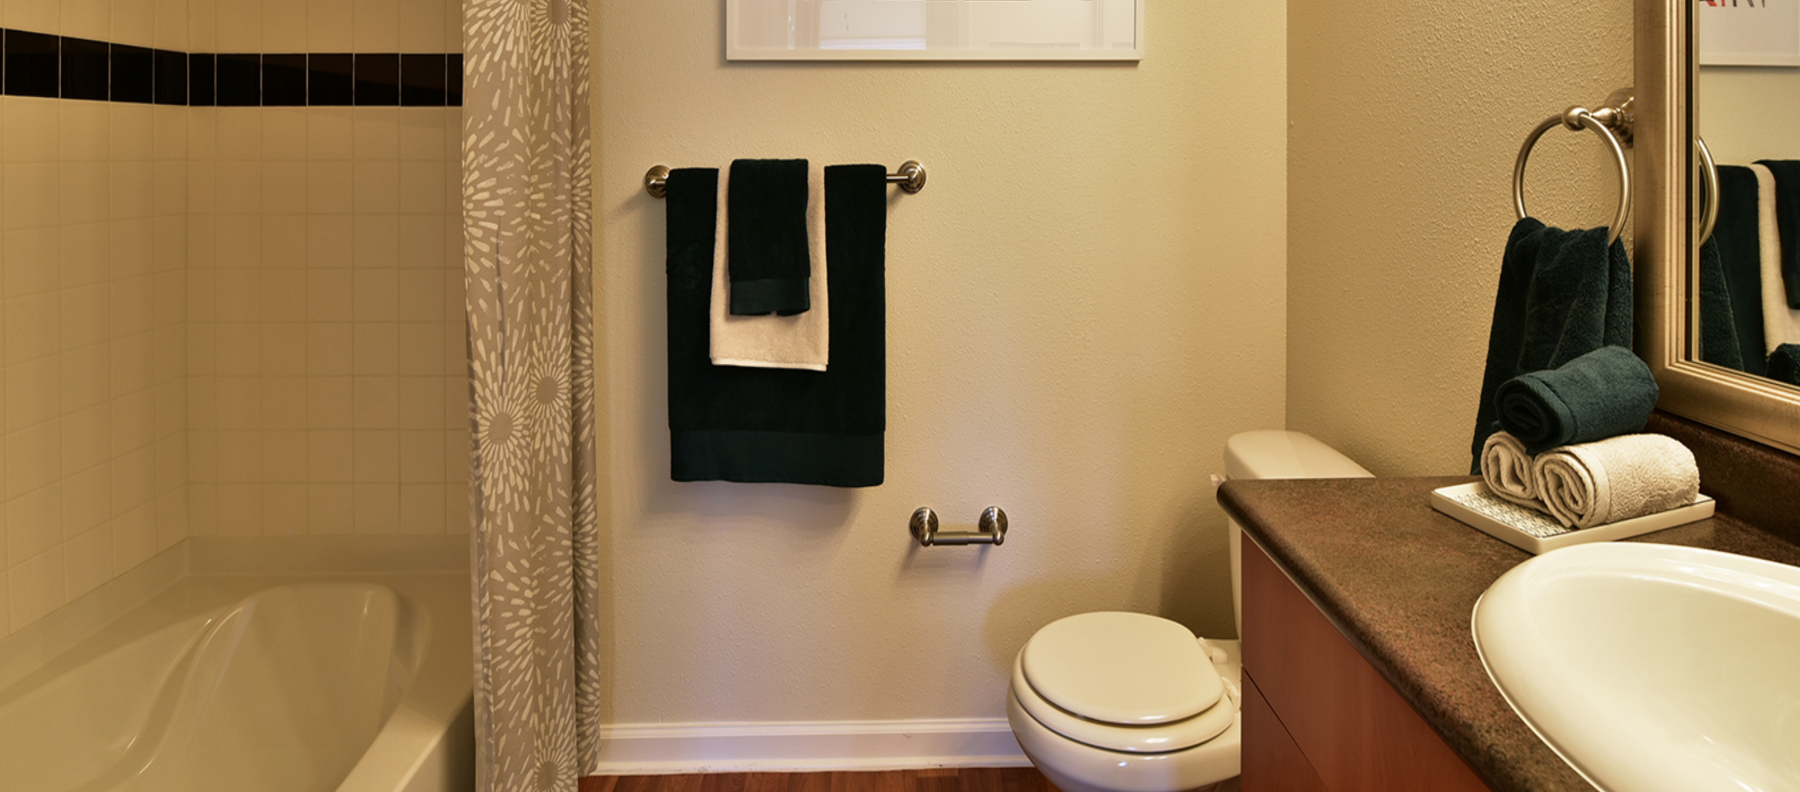 14 - Apartment Bathroom copy 2